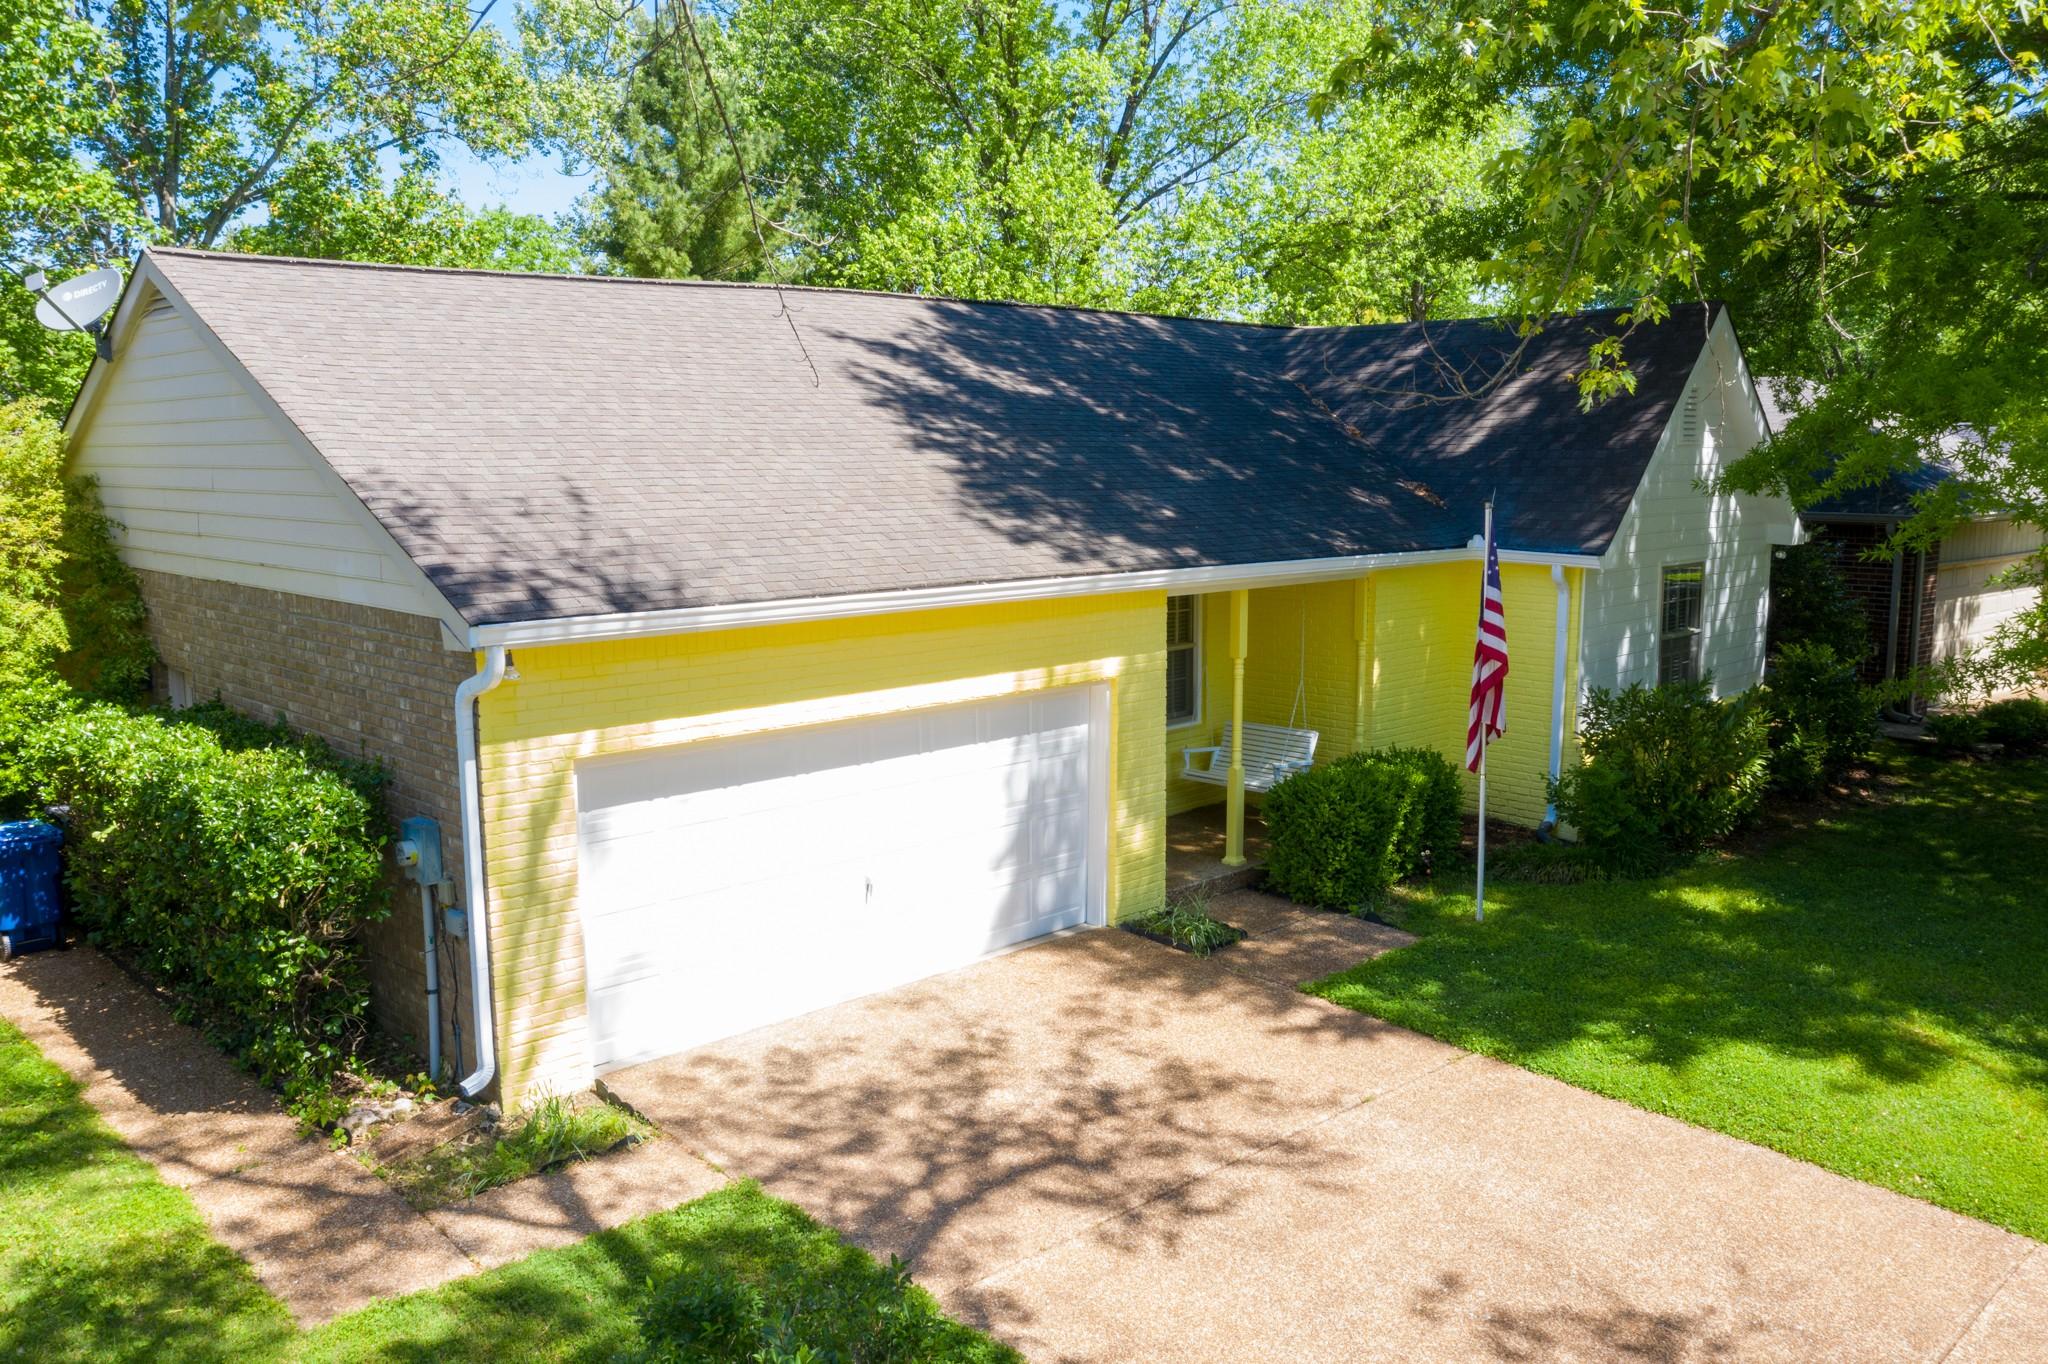 532 Shadycrest Ln Property Photo - Franklin, TN real estate listing